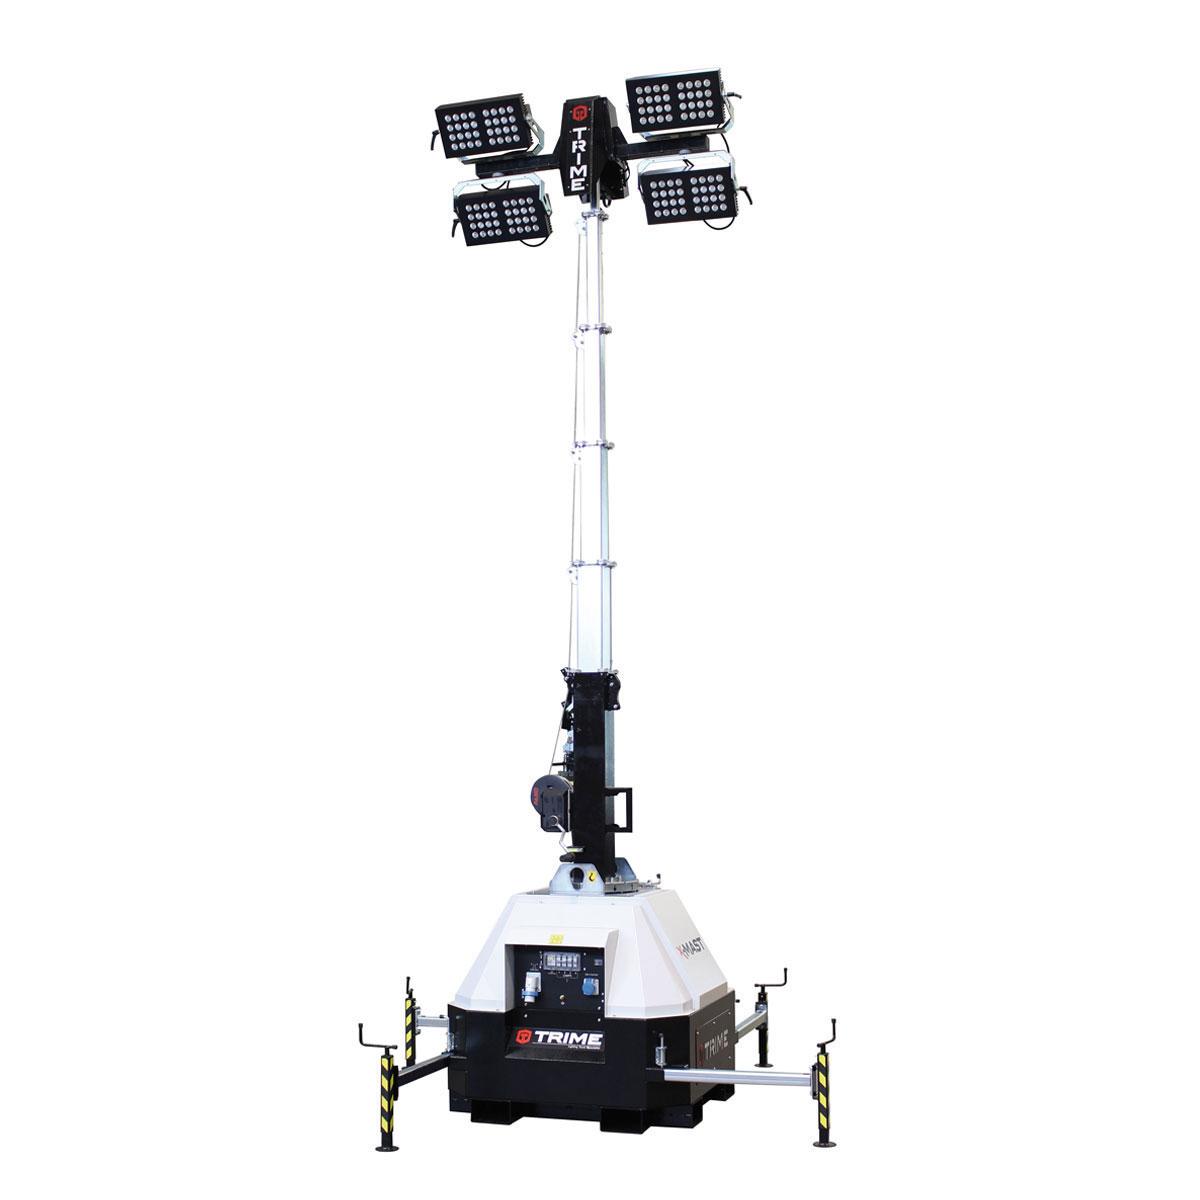 prozektoru-masts-led-x-mast-4x300W-atverta-pozicija